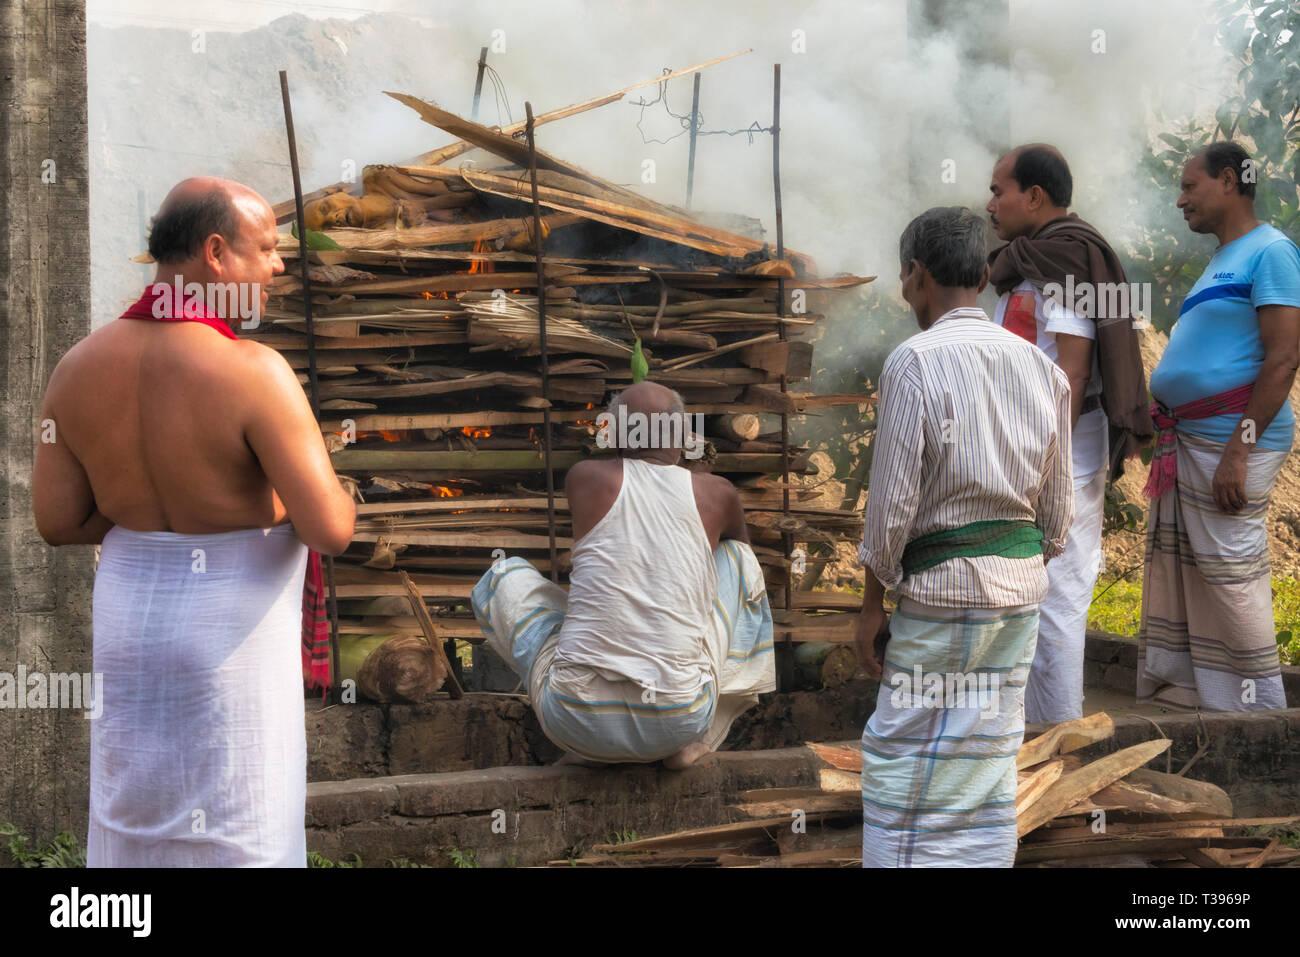 Hindu people burning corpse at funeral, Bogra District, Rajshahi Division,  Bangladesh - Stock Image